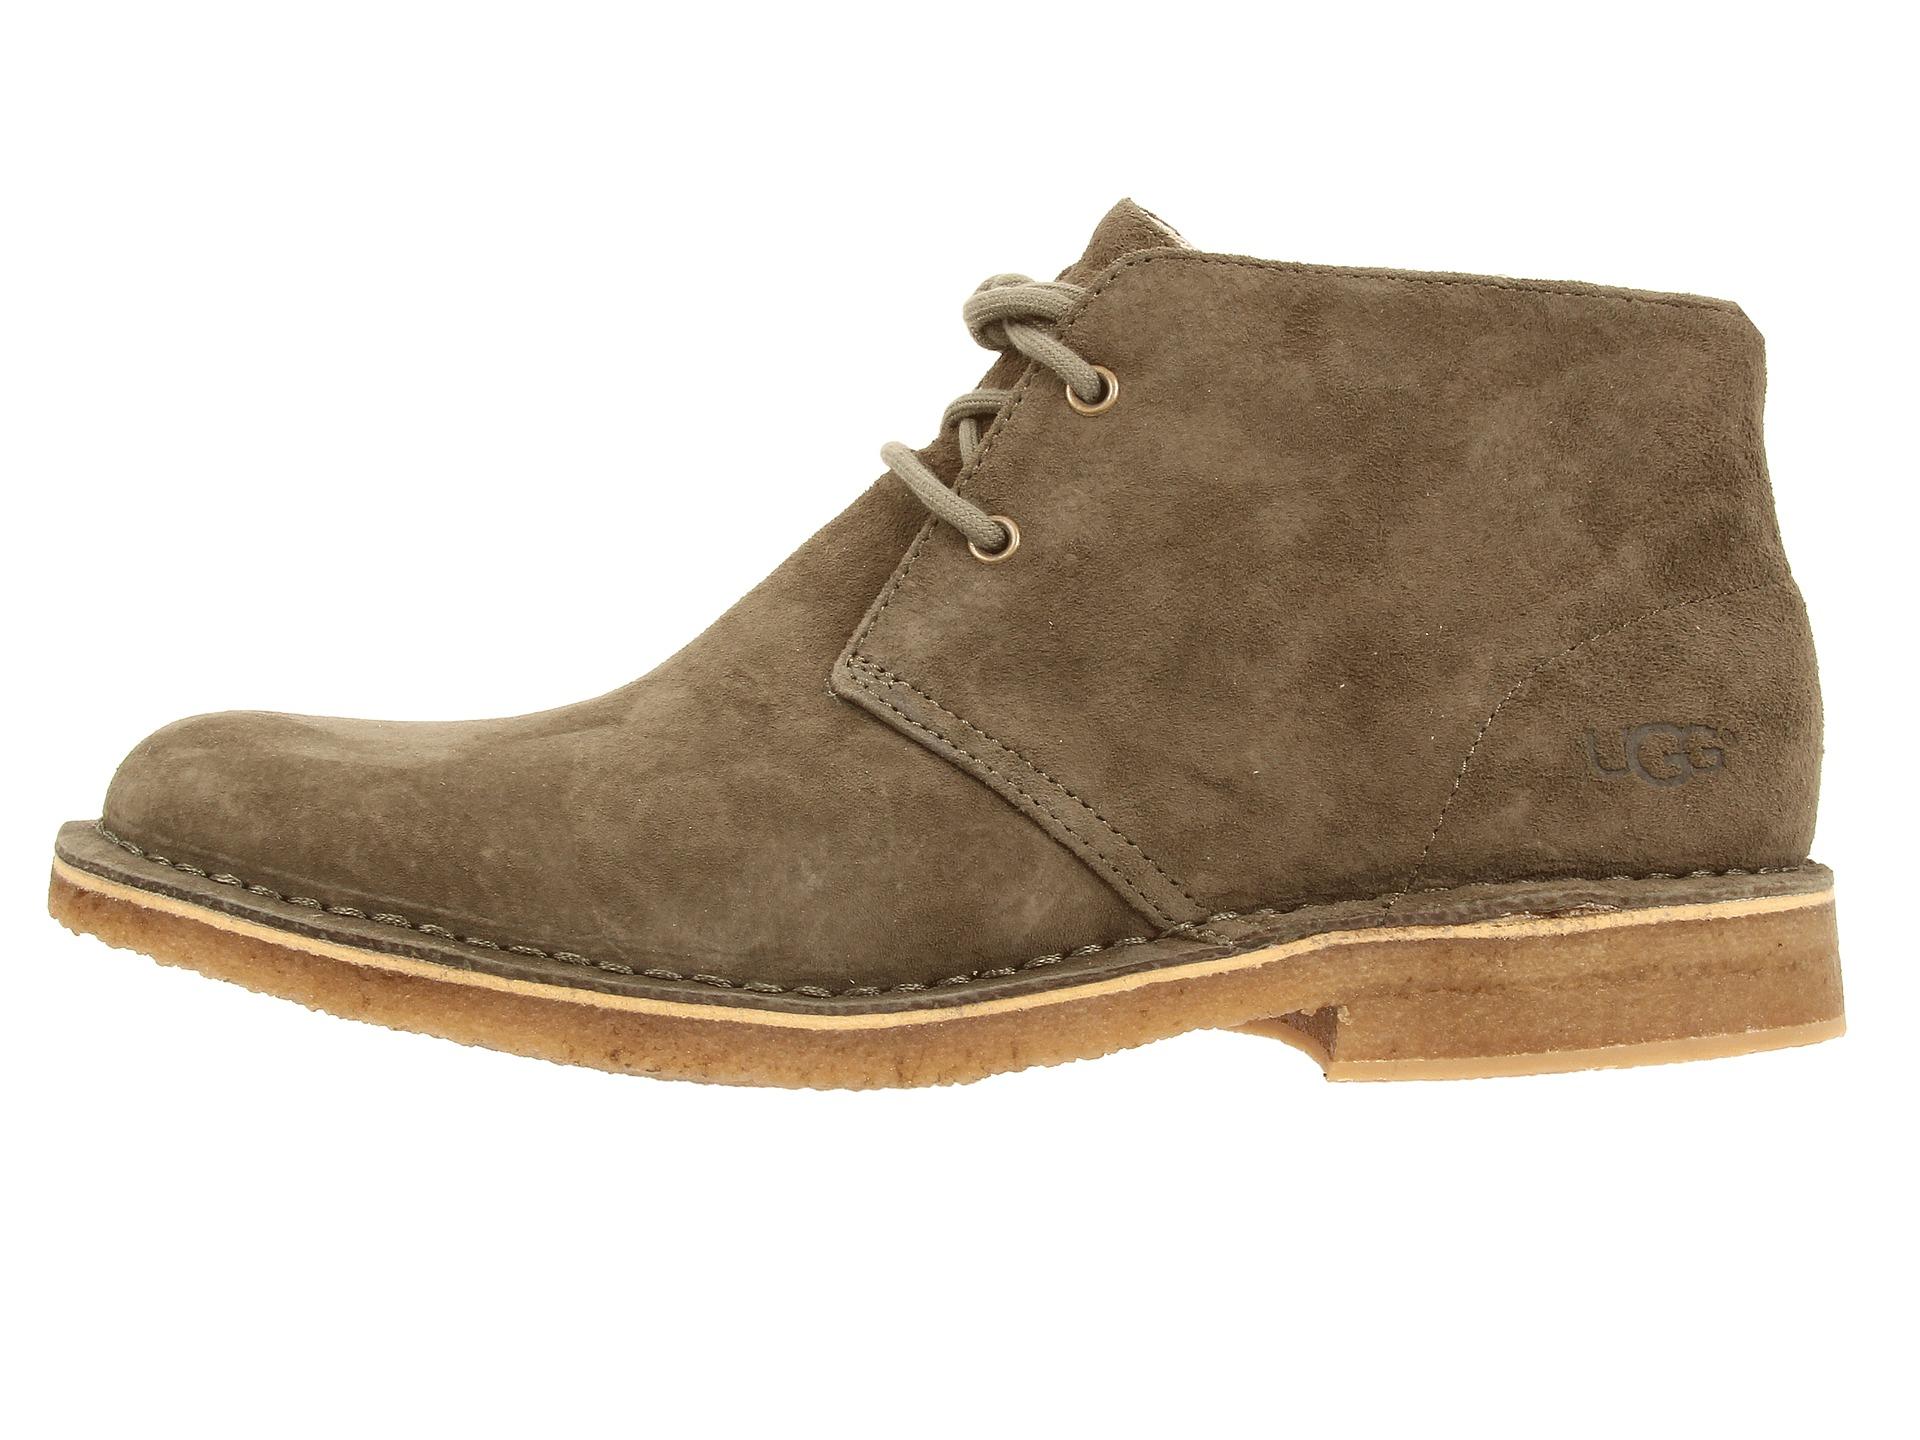 29cfb018ca3 Ugg Australia Leighton Leather Desert Boots - cheap watches mgc-gas.com